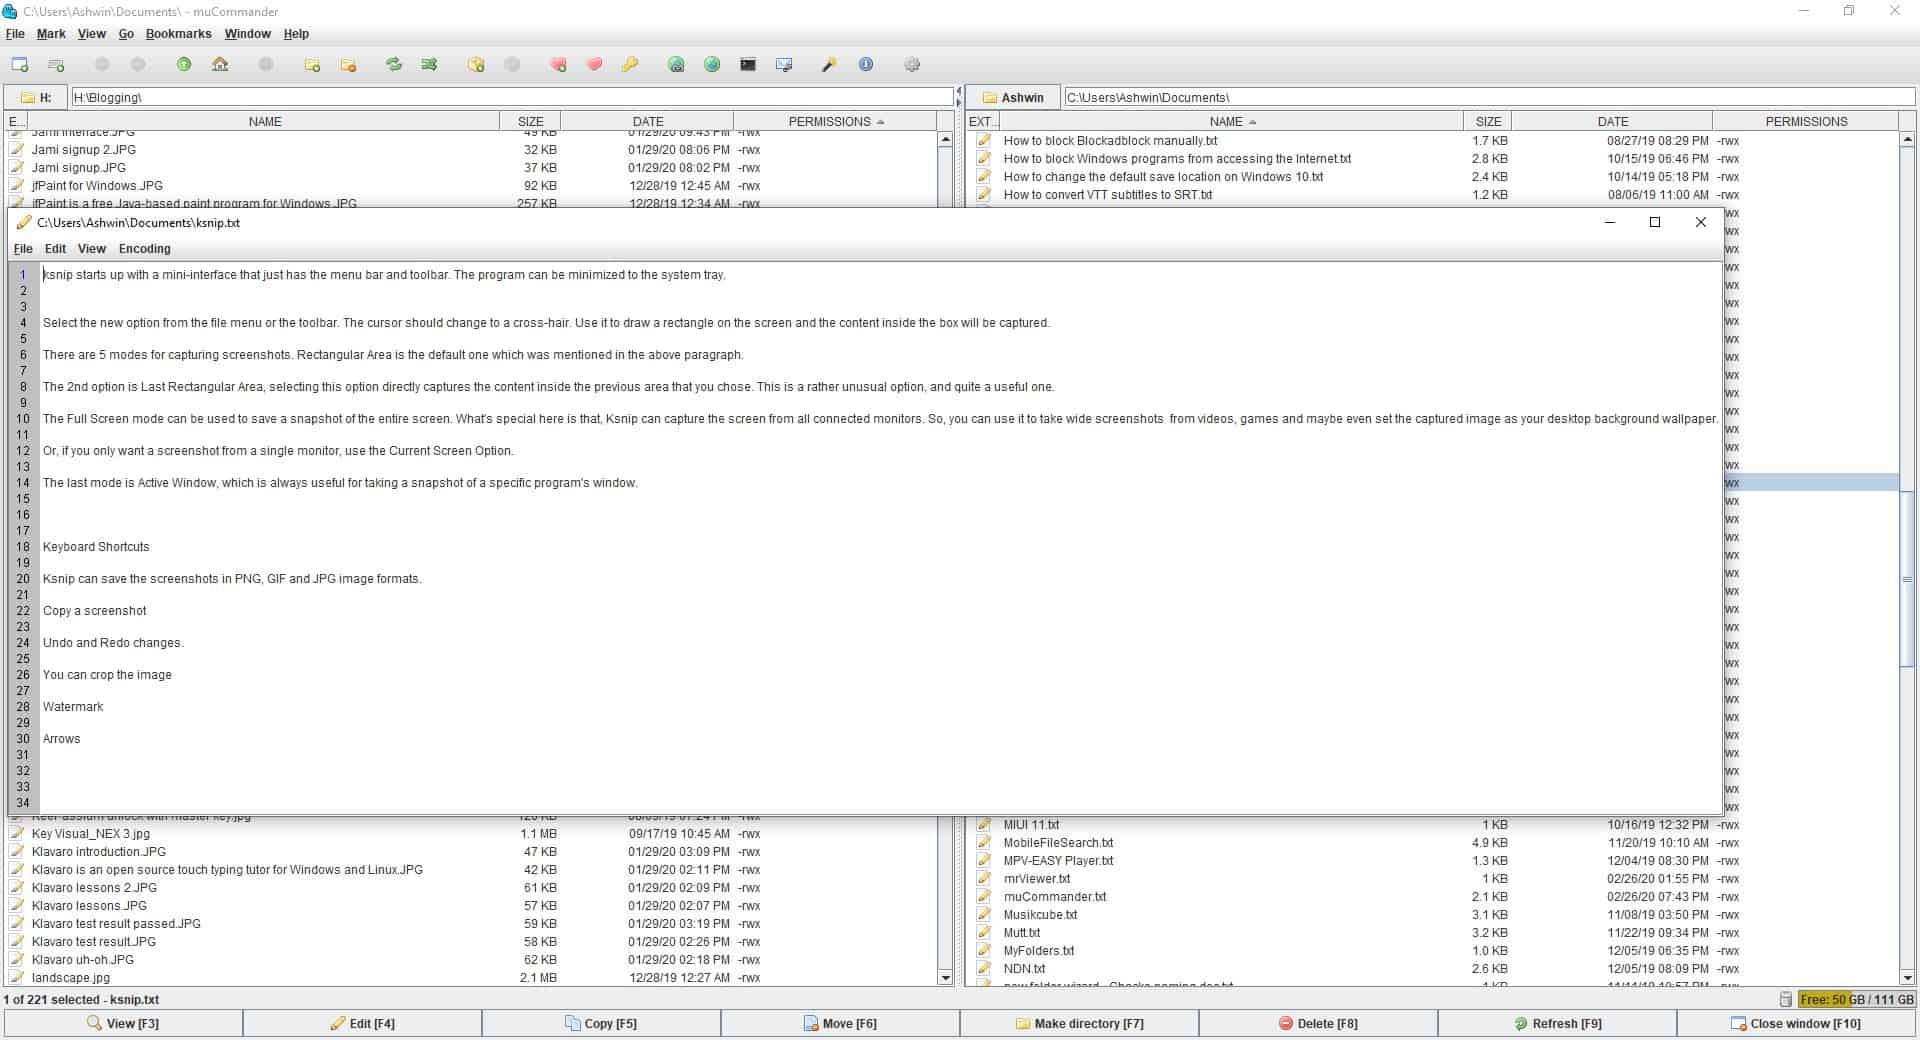 mucommander internal editor - text